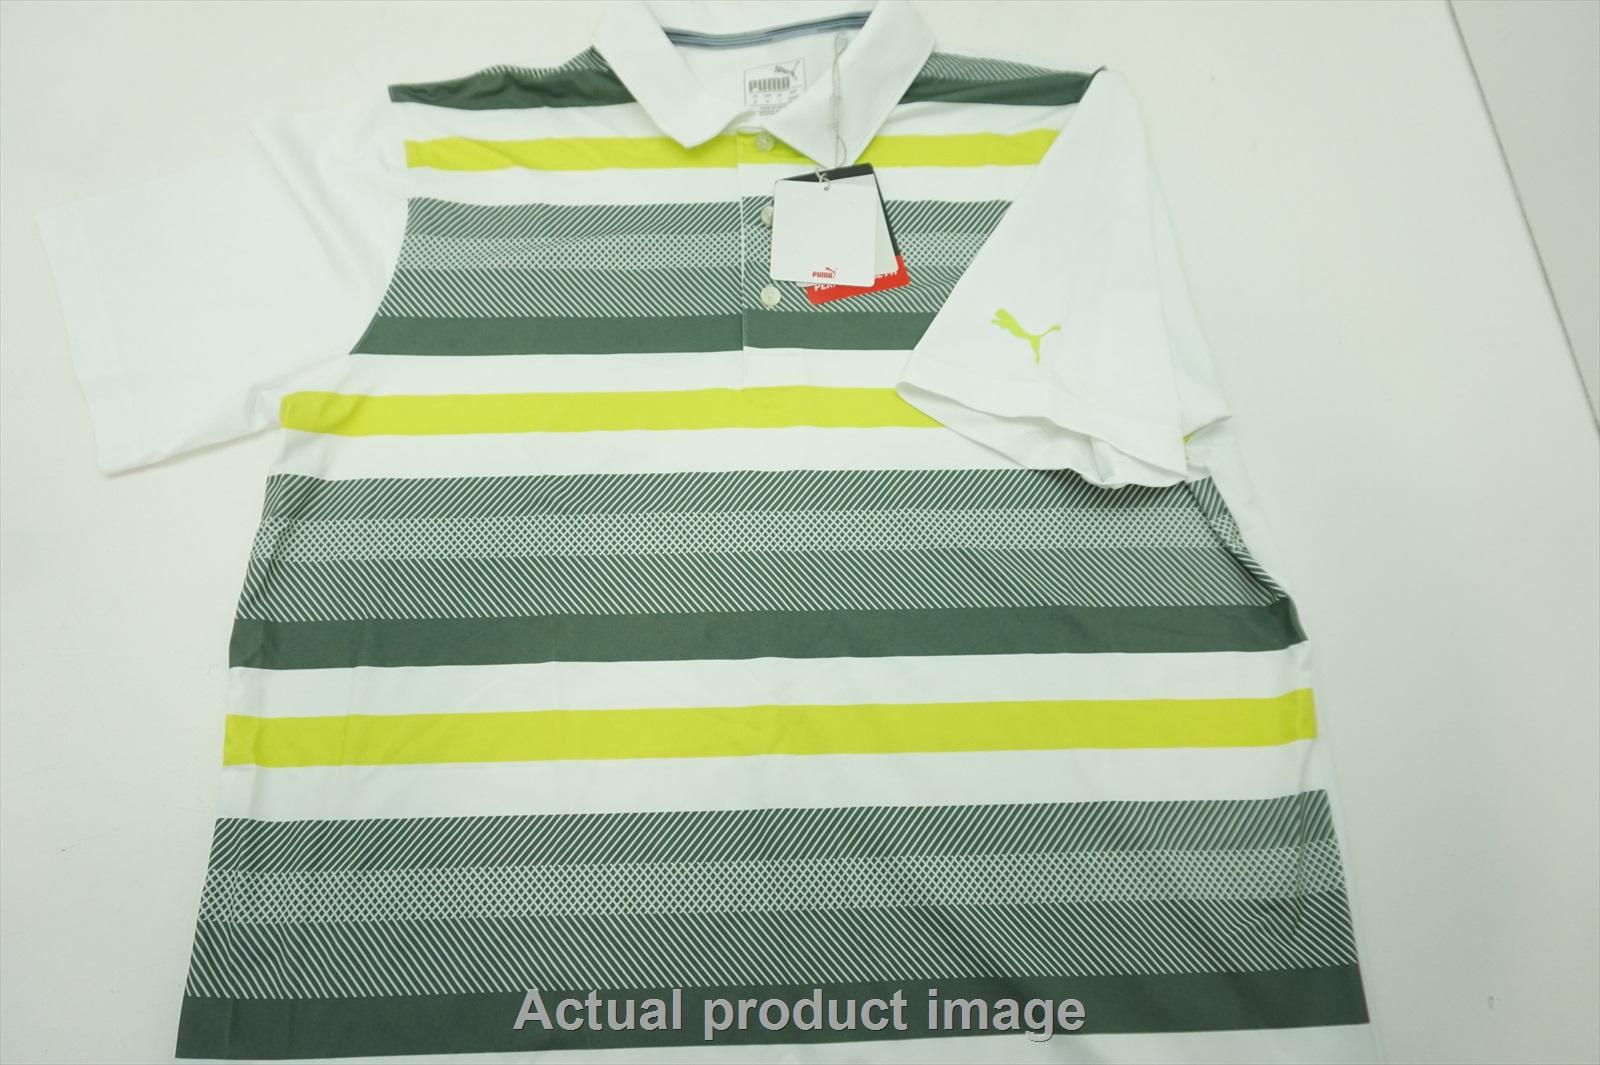 a55e1c5e2e Details about NEW Puma Golf Turf Stripe Polo Mens Size Medium Bright  Wht/Laurel 576923 04 204h